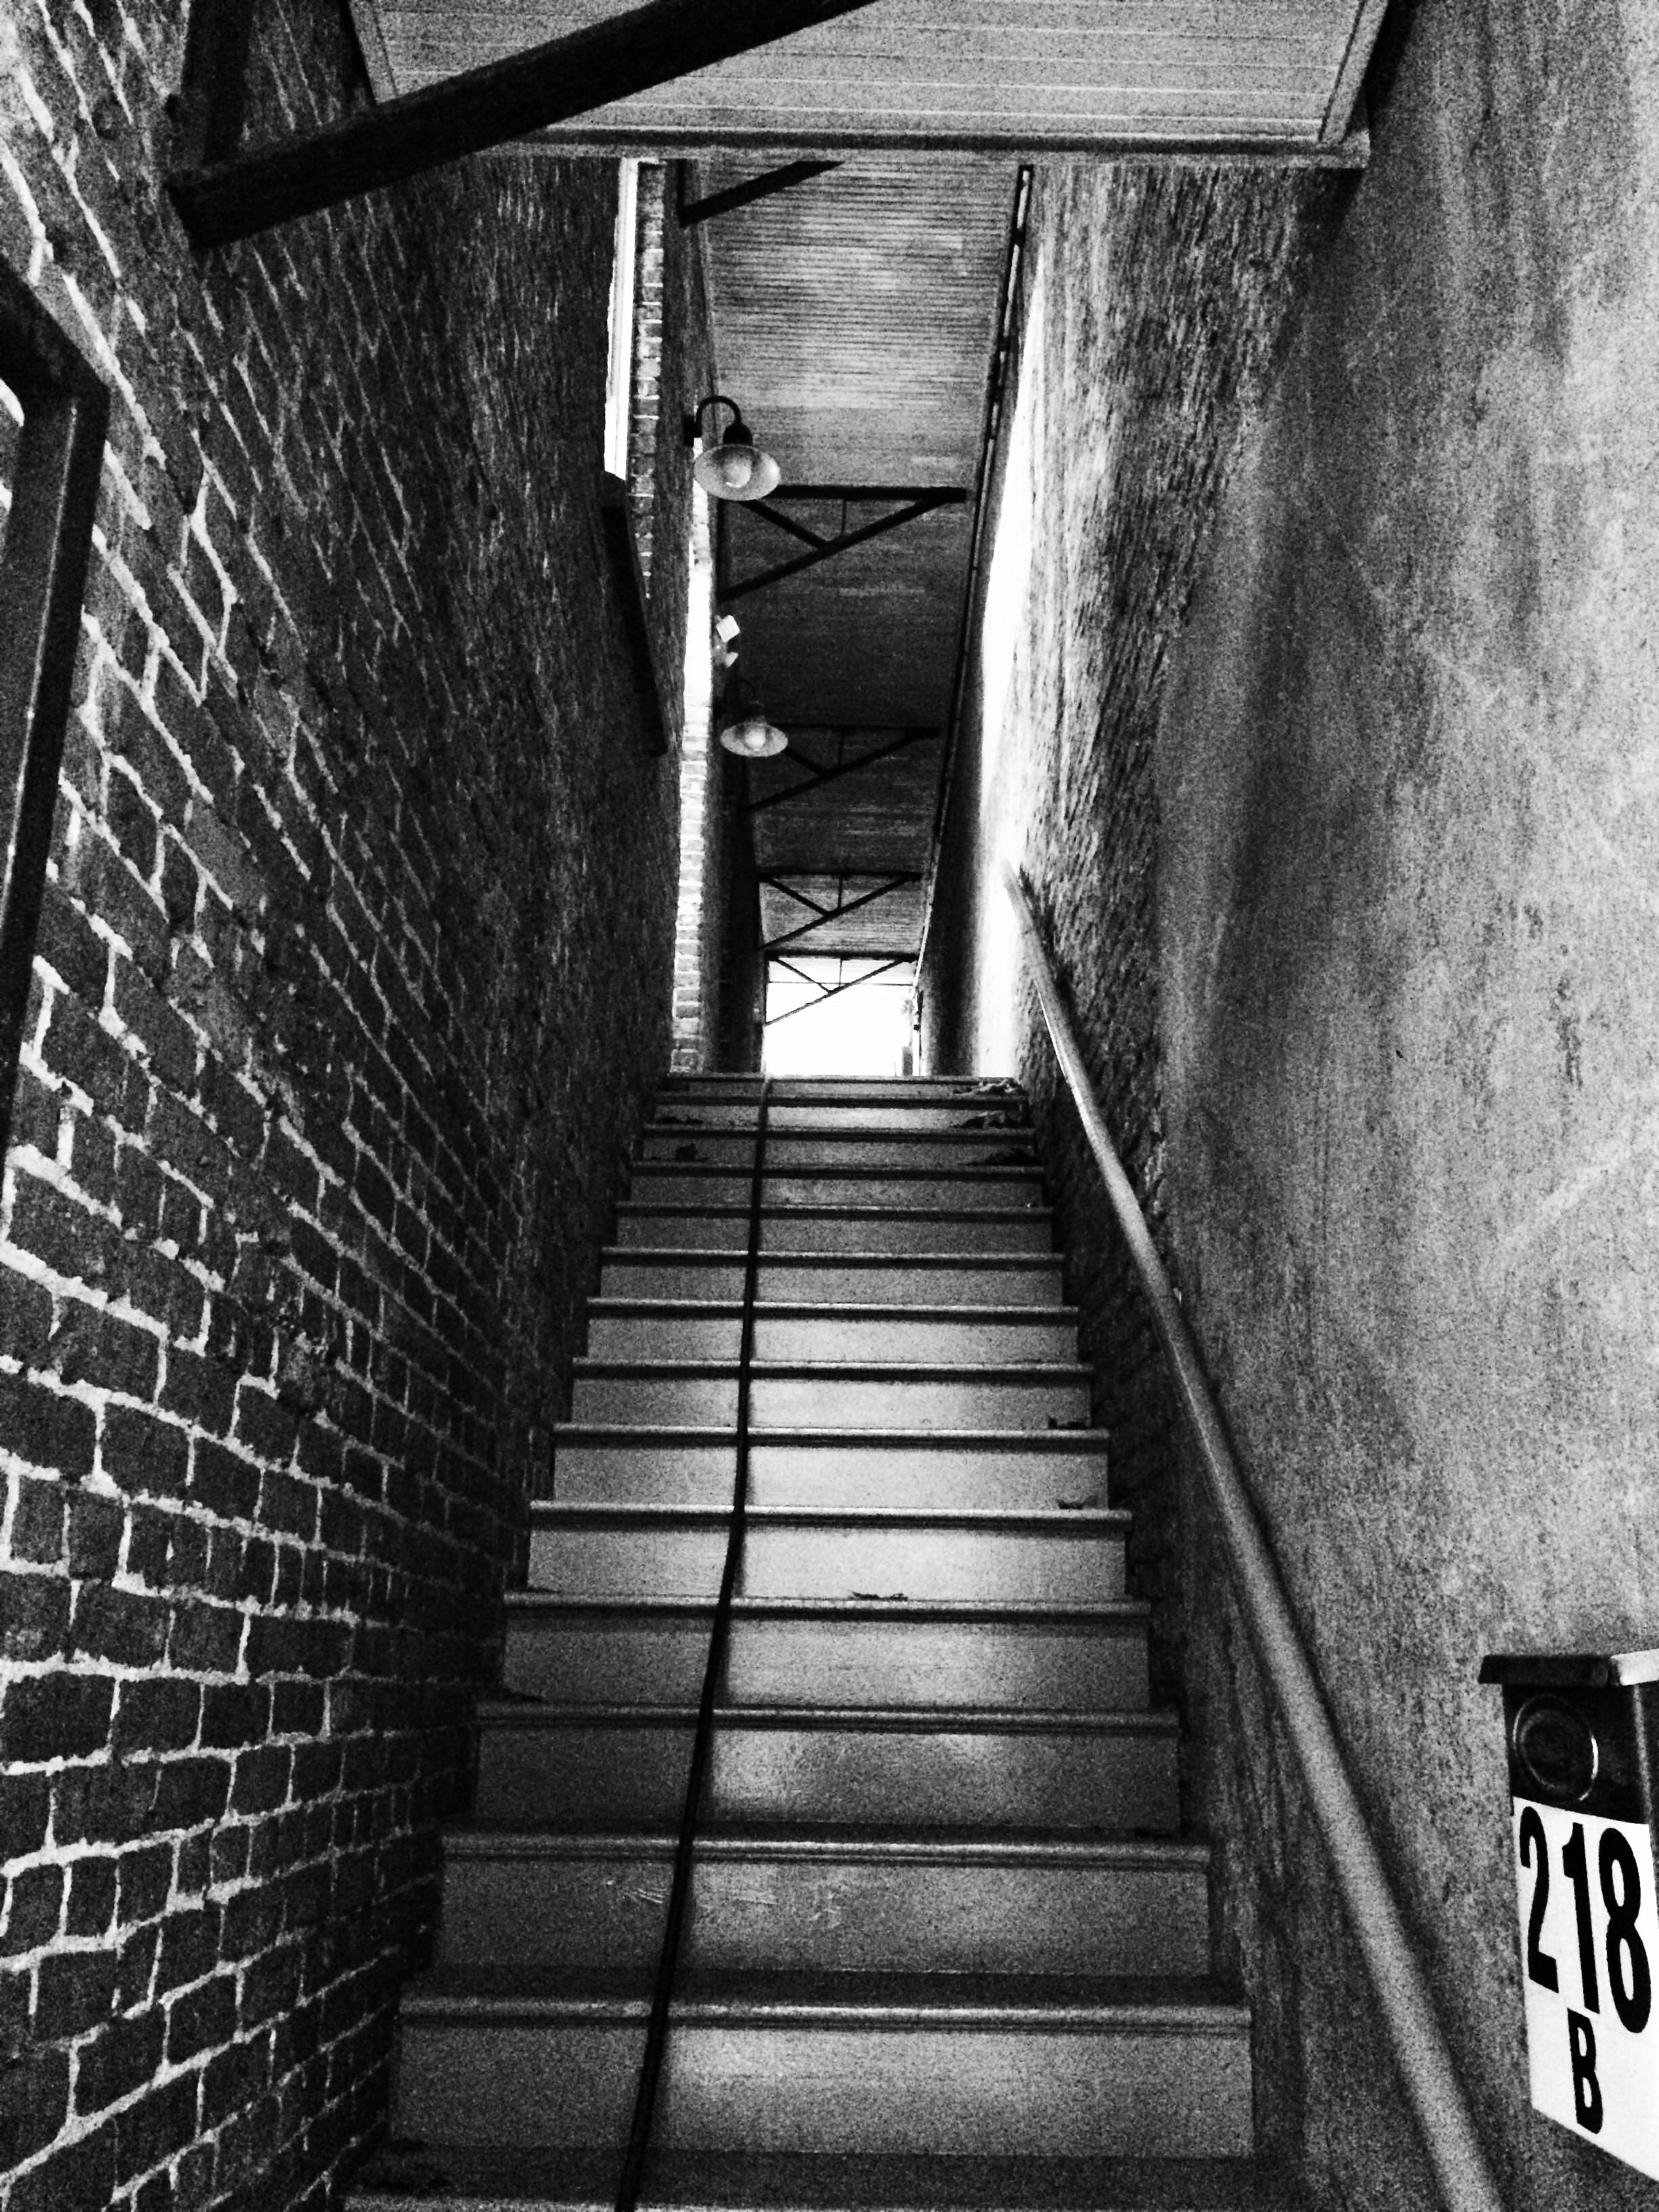 Stairway leading up to the front door.